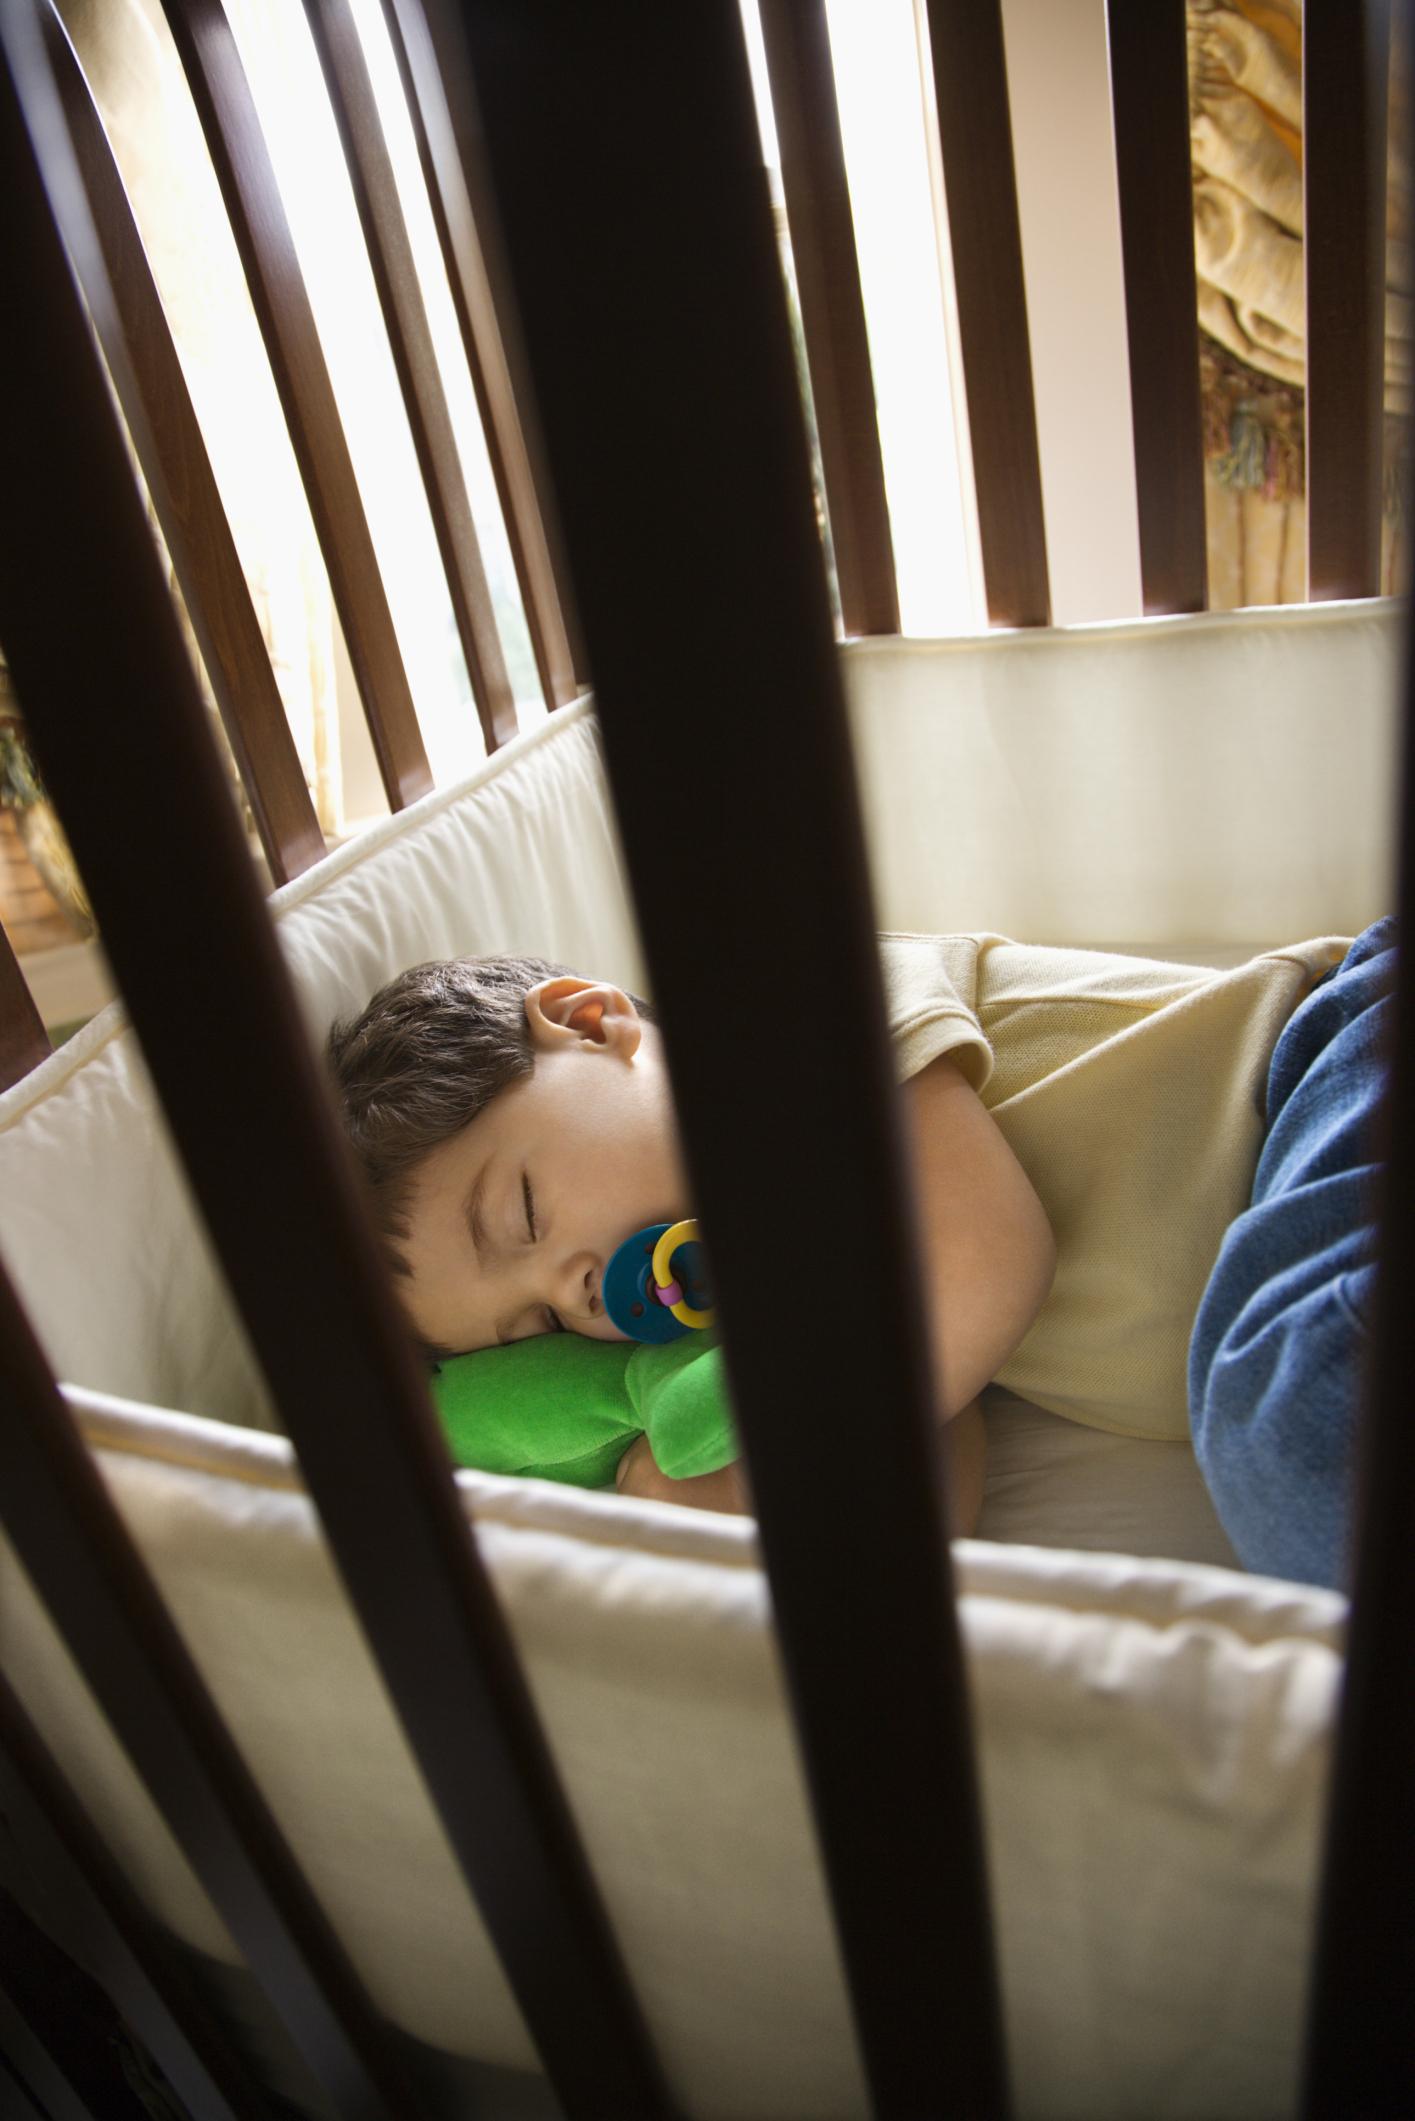 sizes of toddler bed blankets how to adult. Black Bedroom Furniture Sets. Home Design Ideas